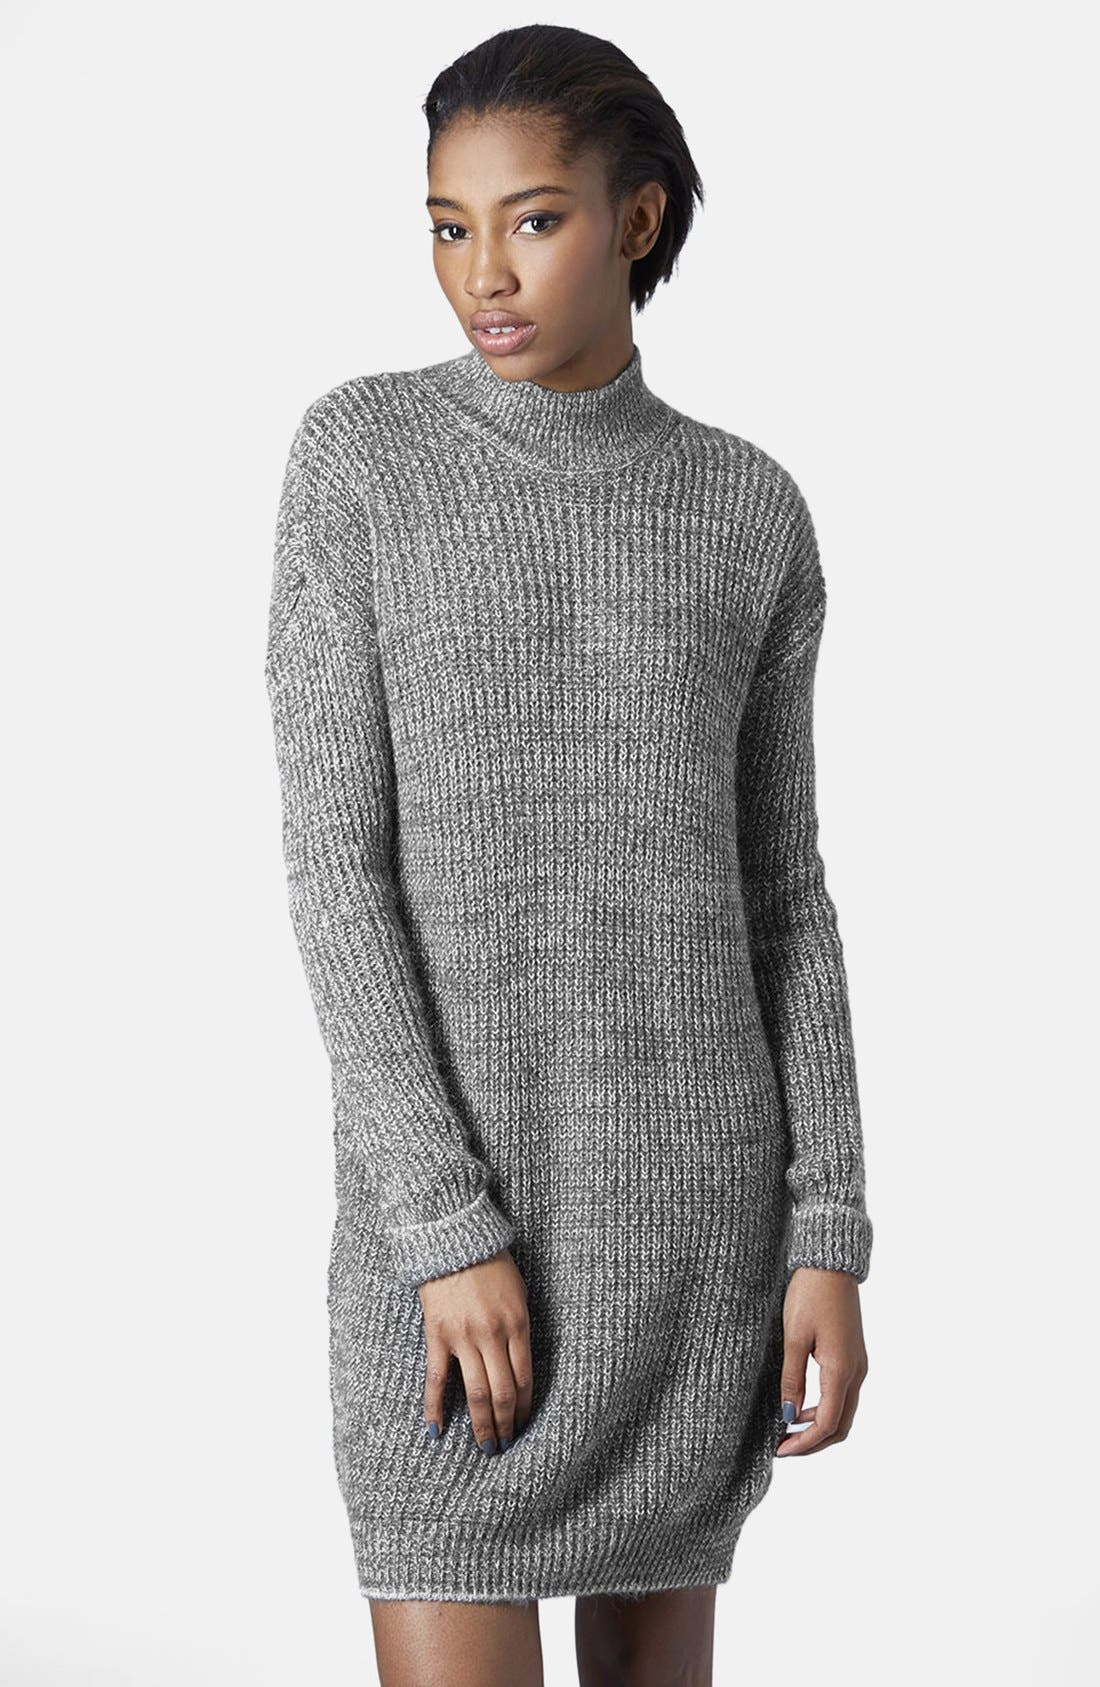 Alternate Image 1 Selected - Topshop Sweater Dress